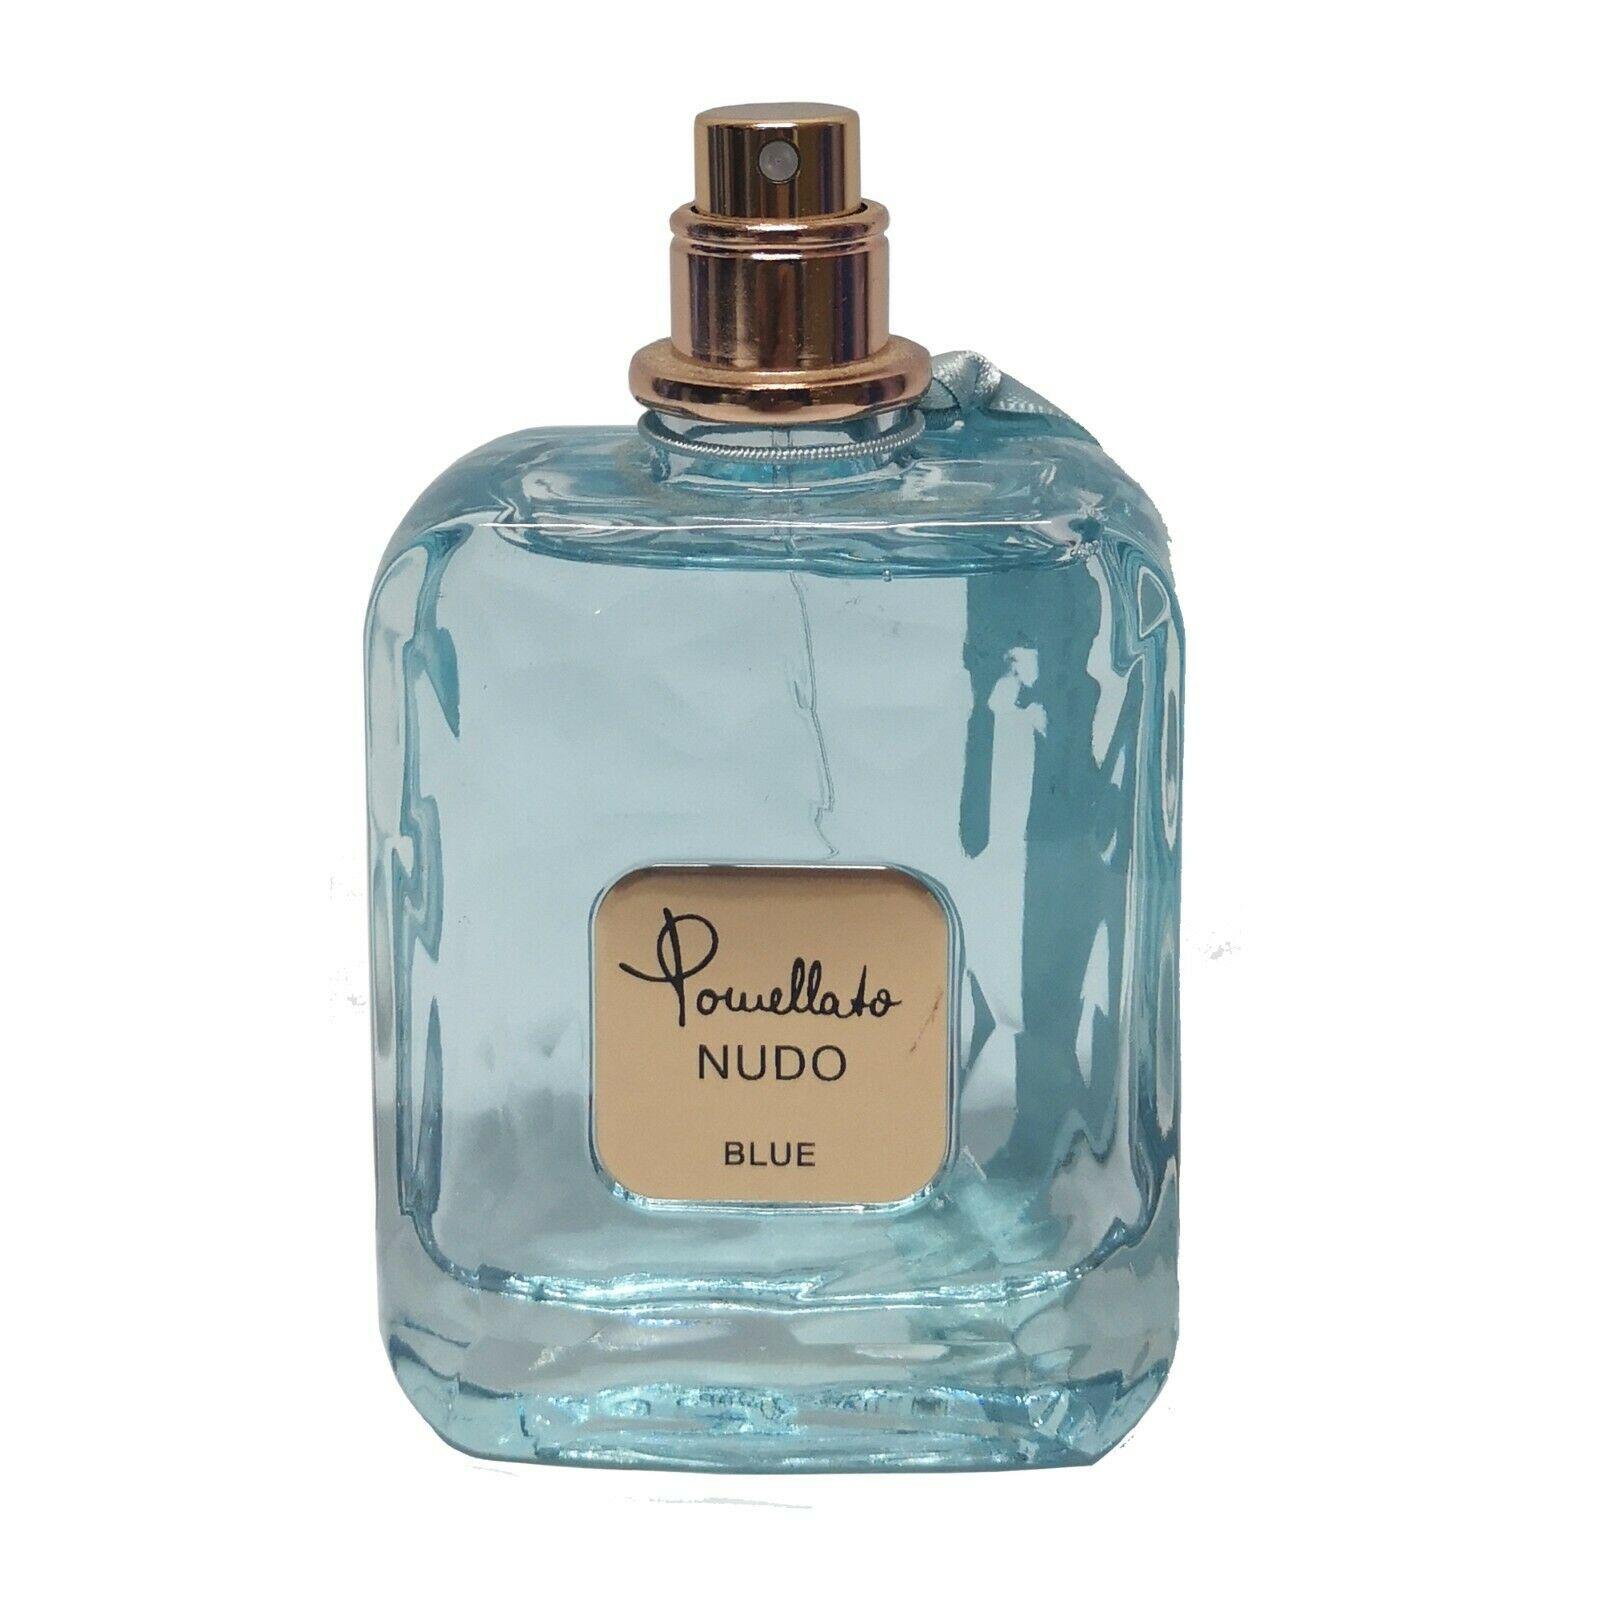 Image of Pomellato Nudo Blue - Eau de Parfum 90 ml